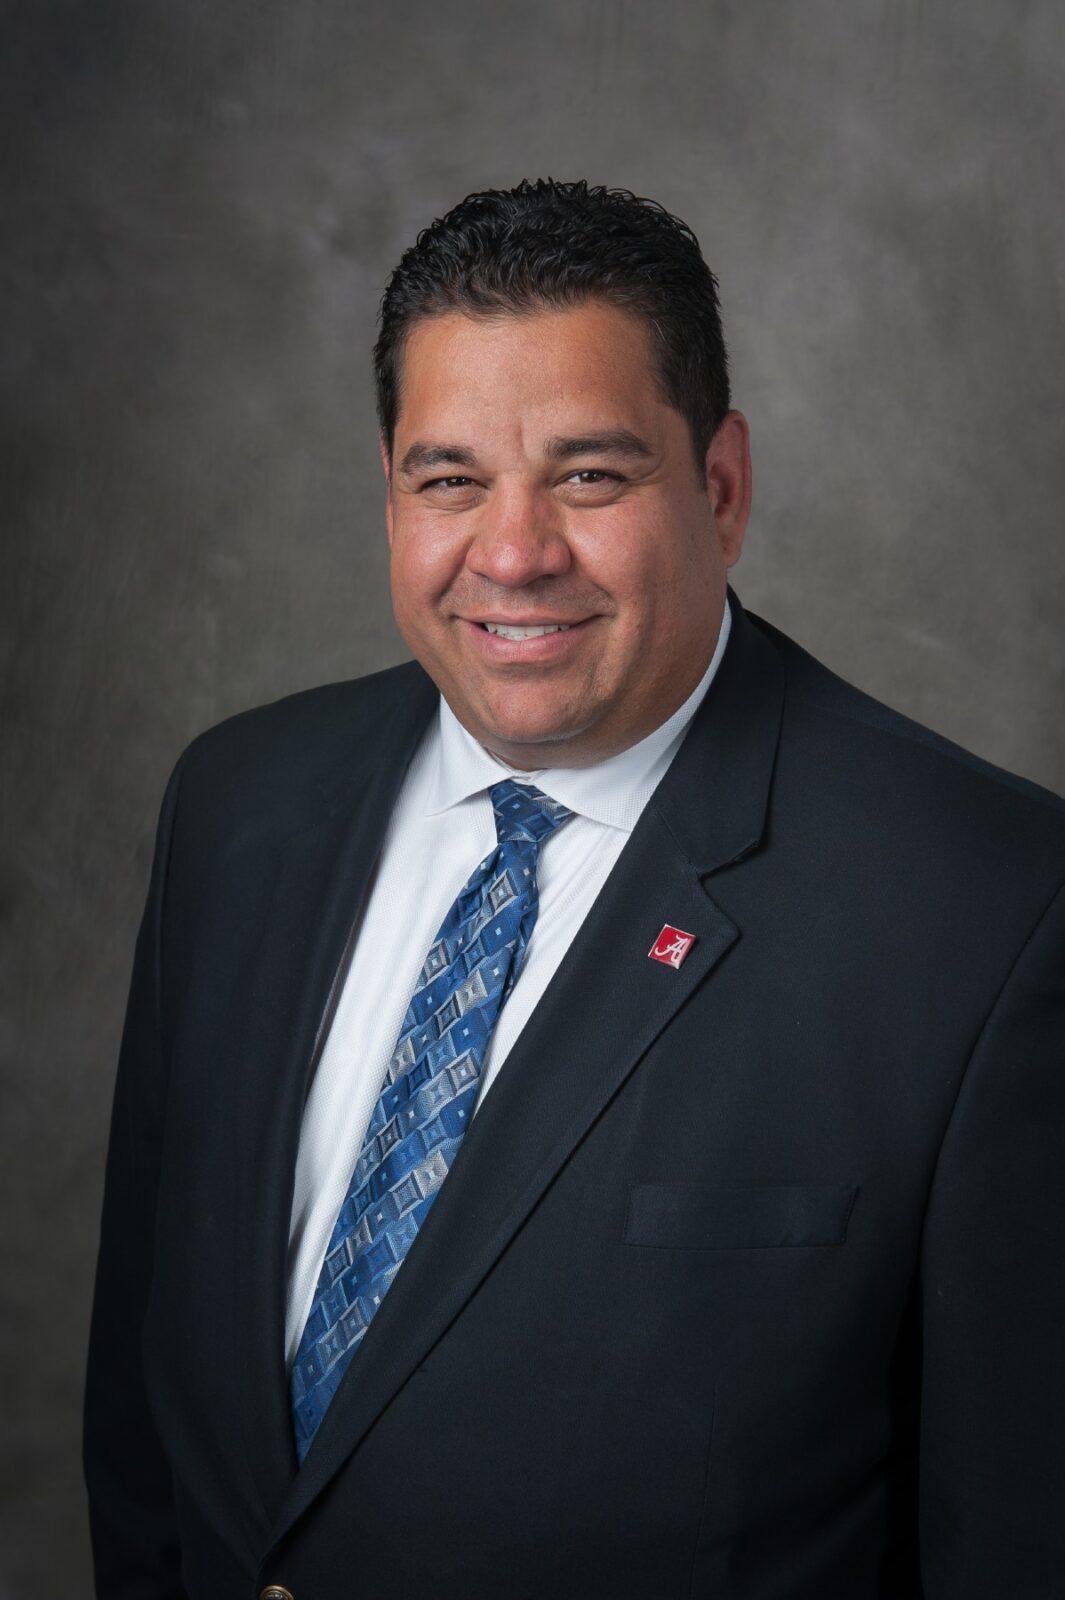 Jaime M. Garza, MS, CADC, NCAC II